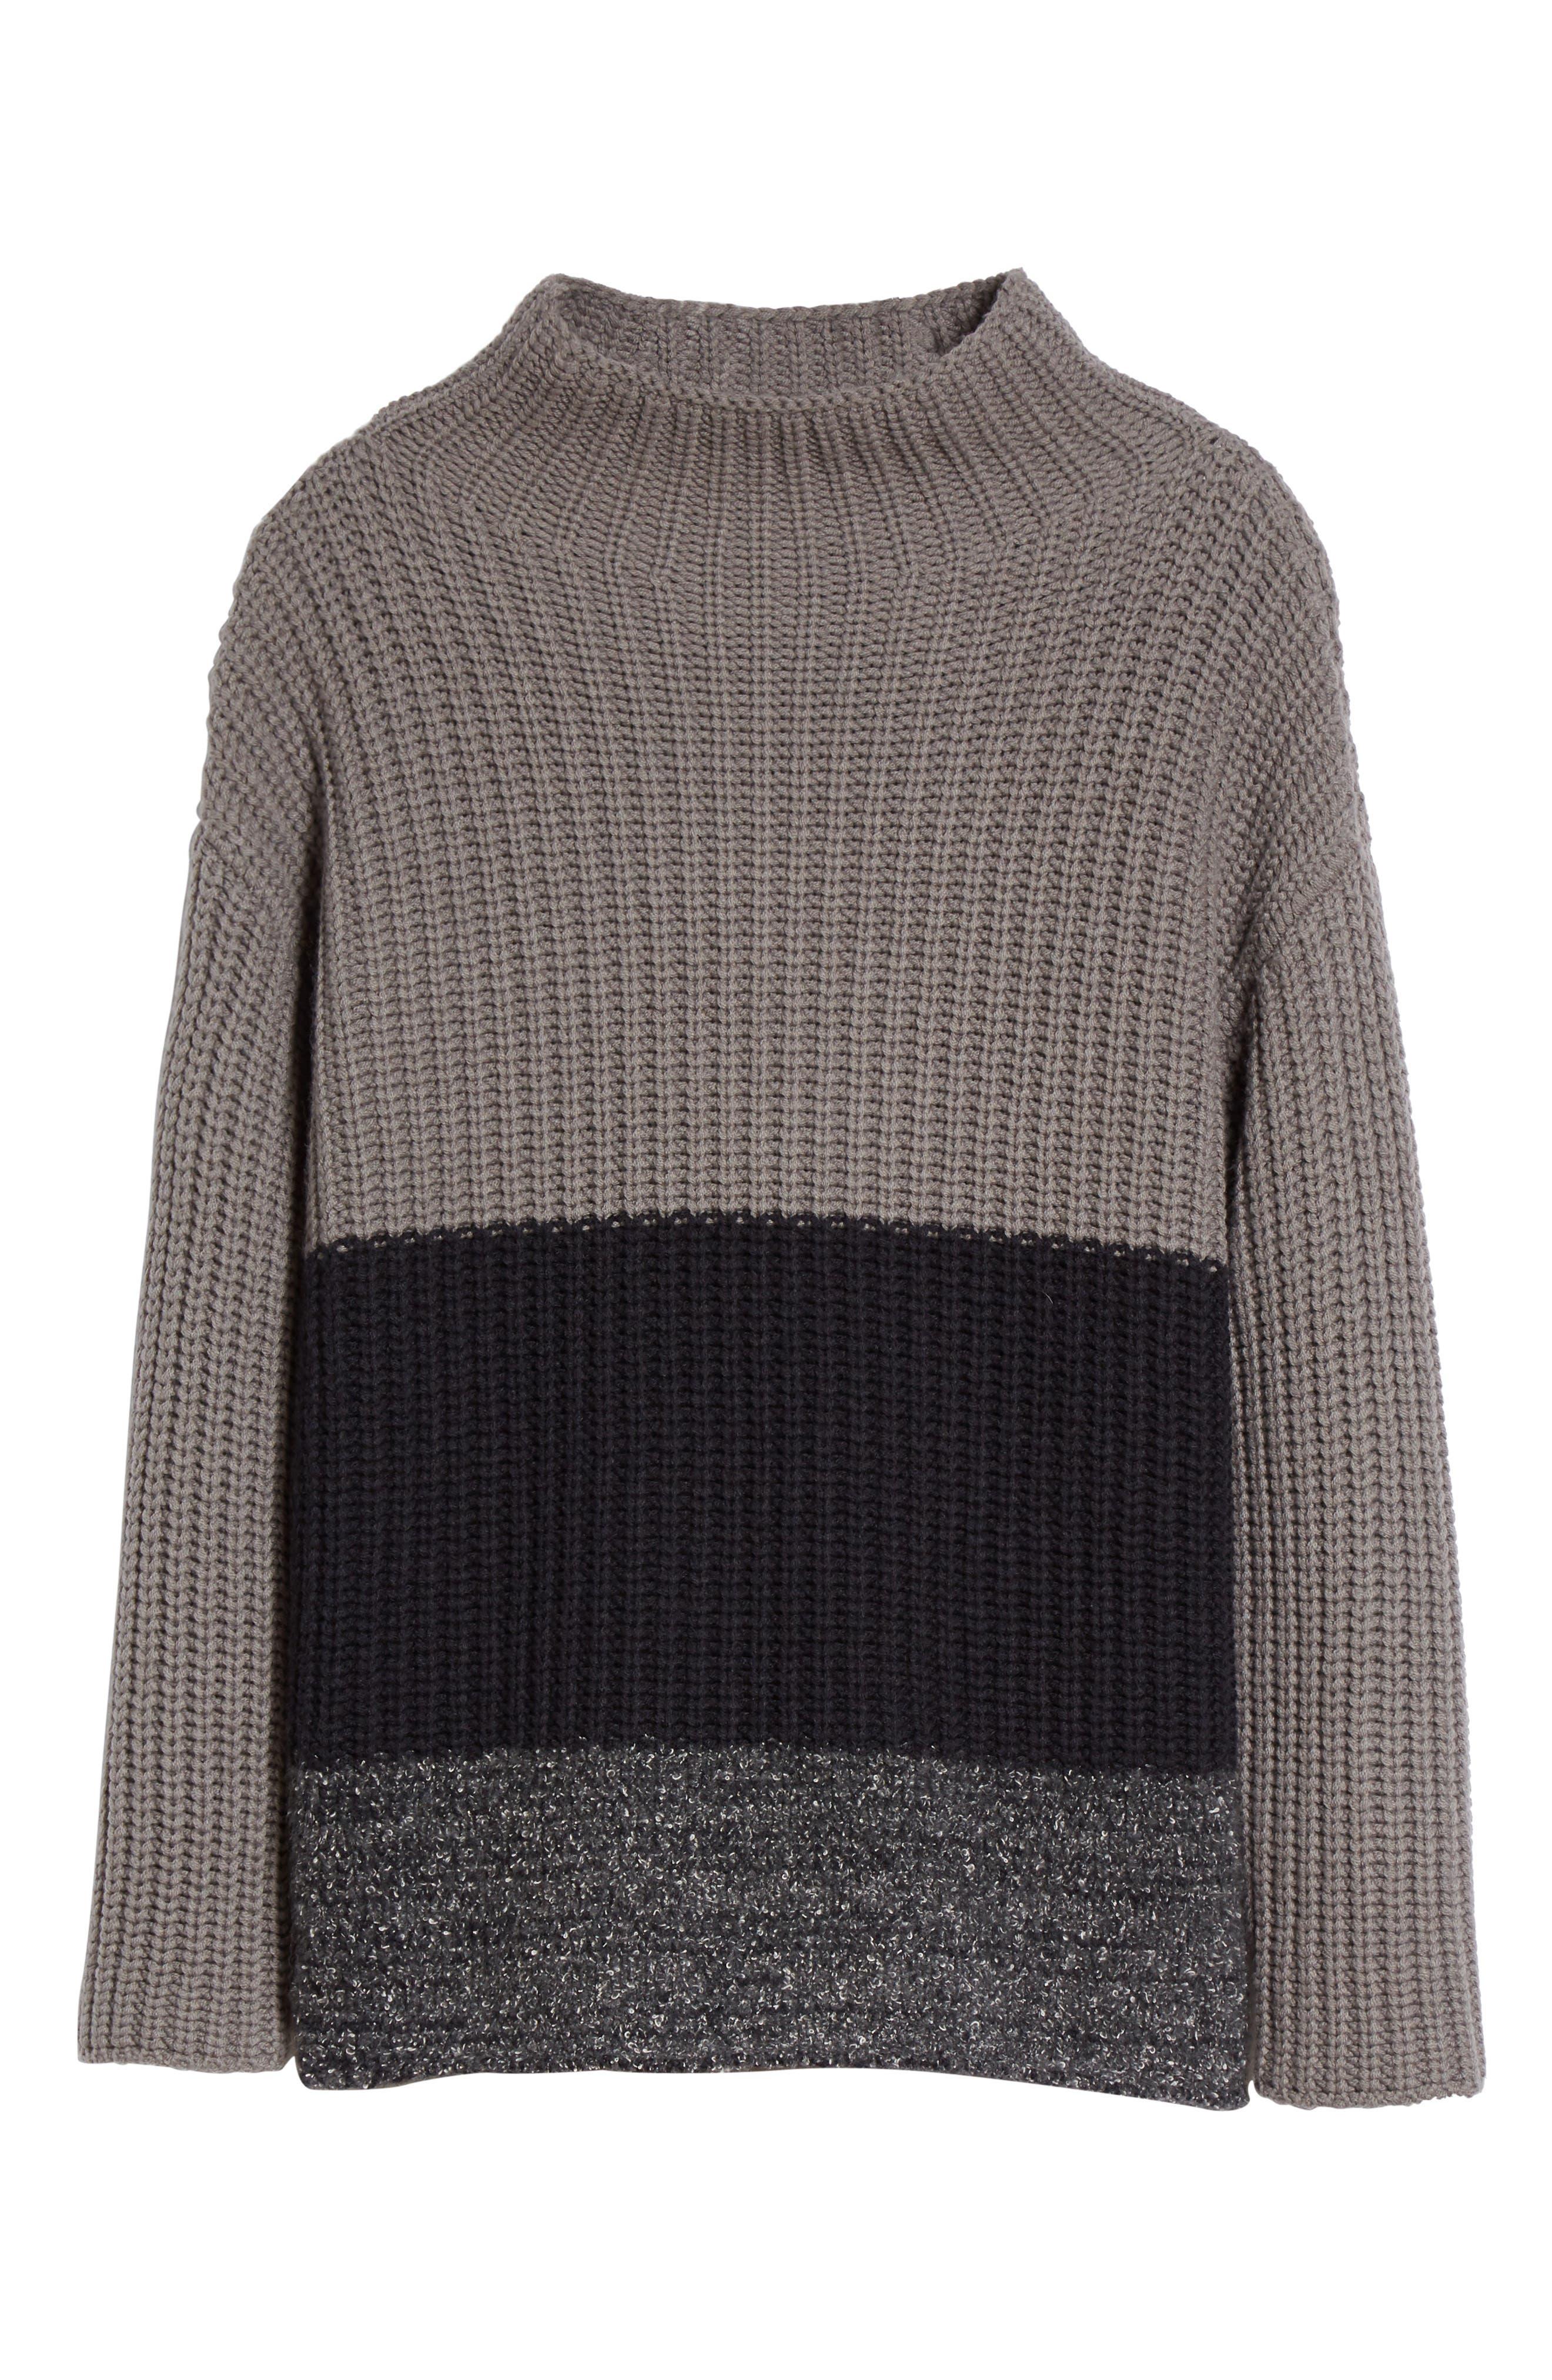 Ribbed Colorblock Sweater,                             Alternate thumbnail 4, color,                             Grey Multi